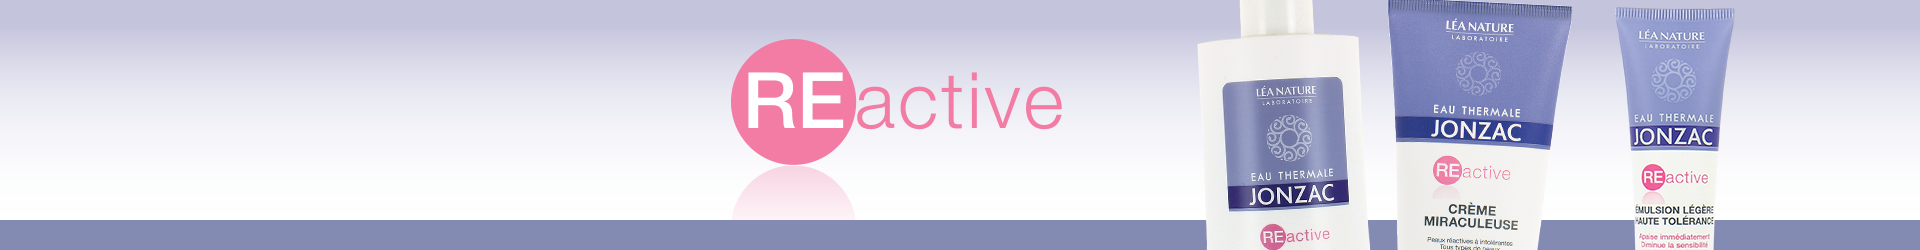 gamme-reactive-jonzac